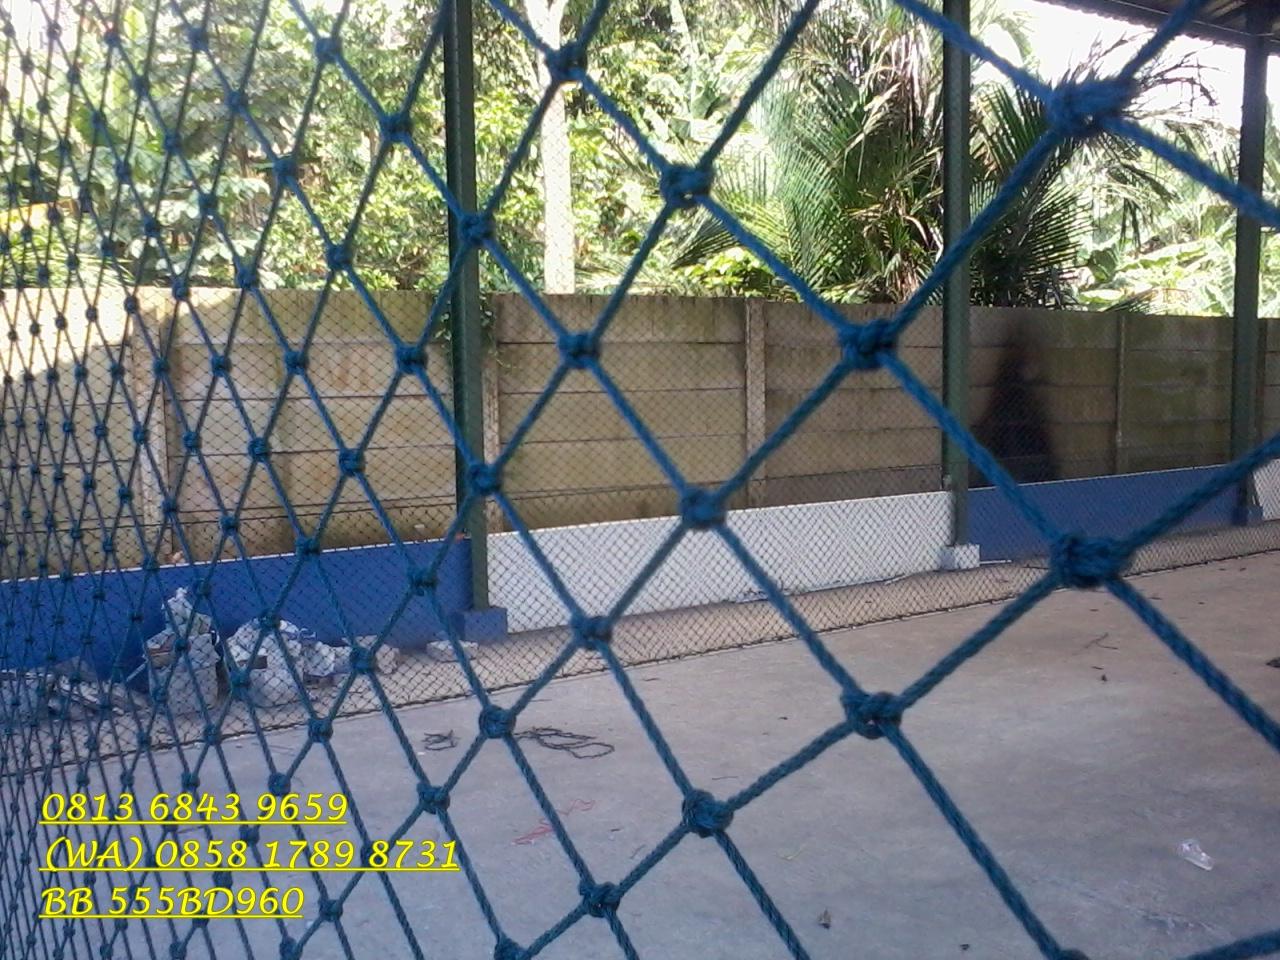 Jaring lapangan futsal: Jual Jaring futsal dan Distributor ...